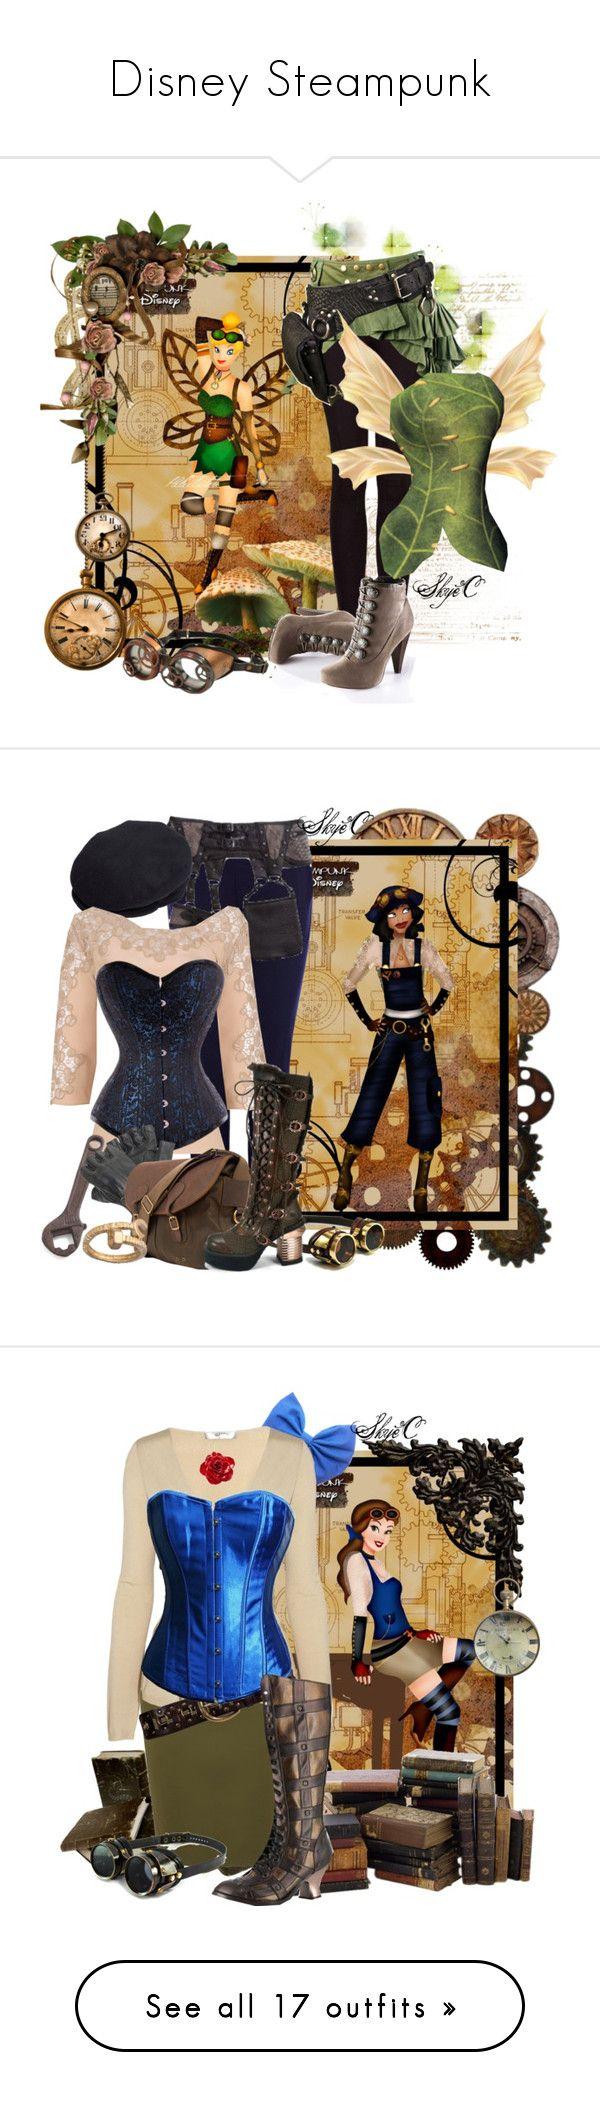 """Disney Steampunk"" by tinkerbell06 ❤ liked on Polyvore featuring MANGO, Laura Scott, disney, tinkerbell, steampunk, Disney, Karen Millen, Barneys New York, Versace and Barbour"